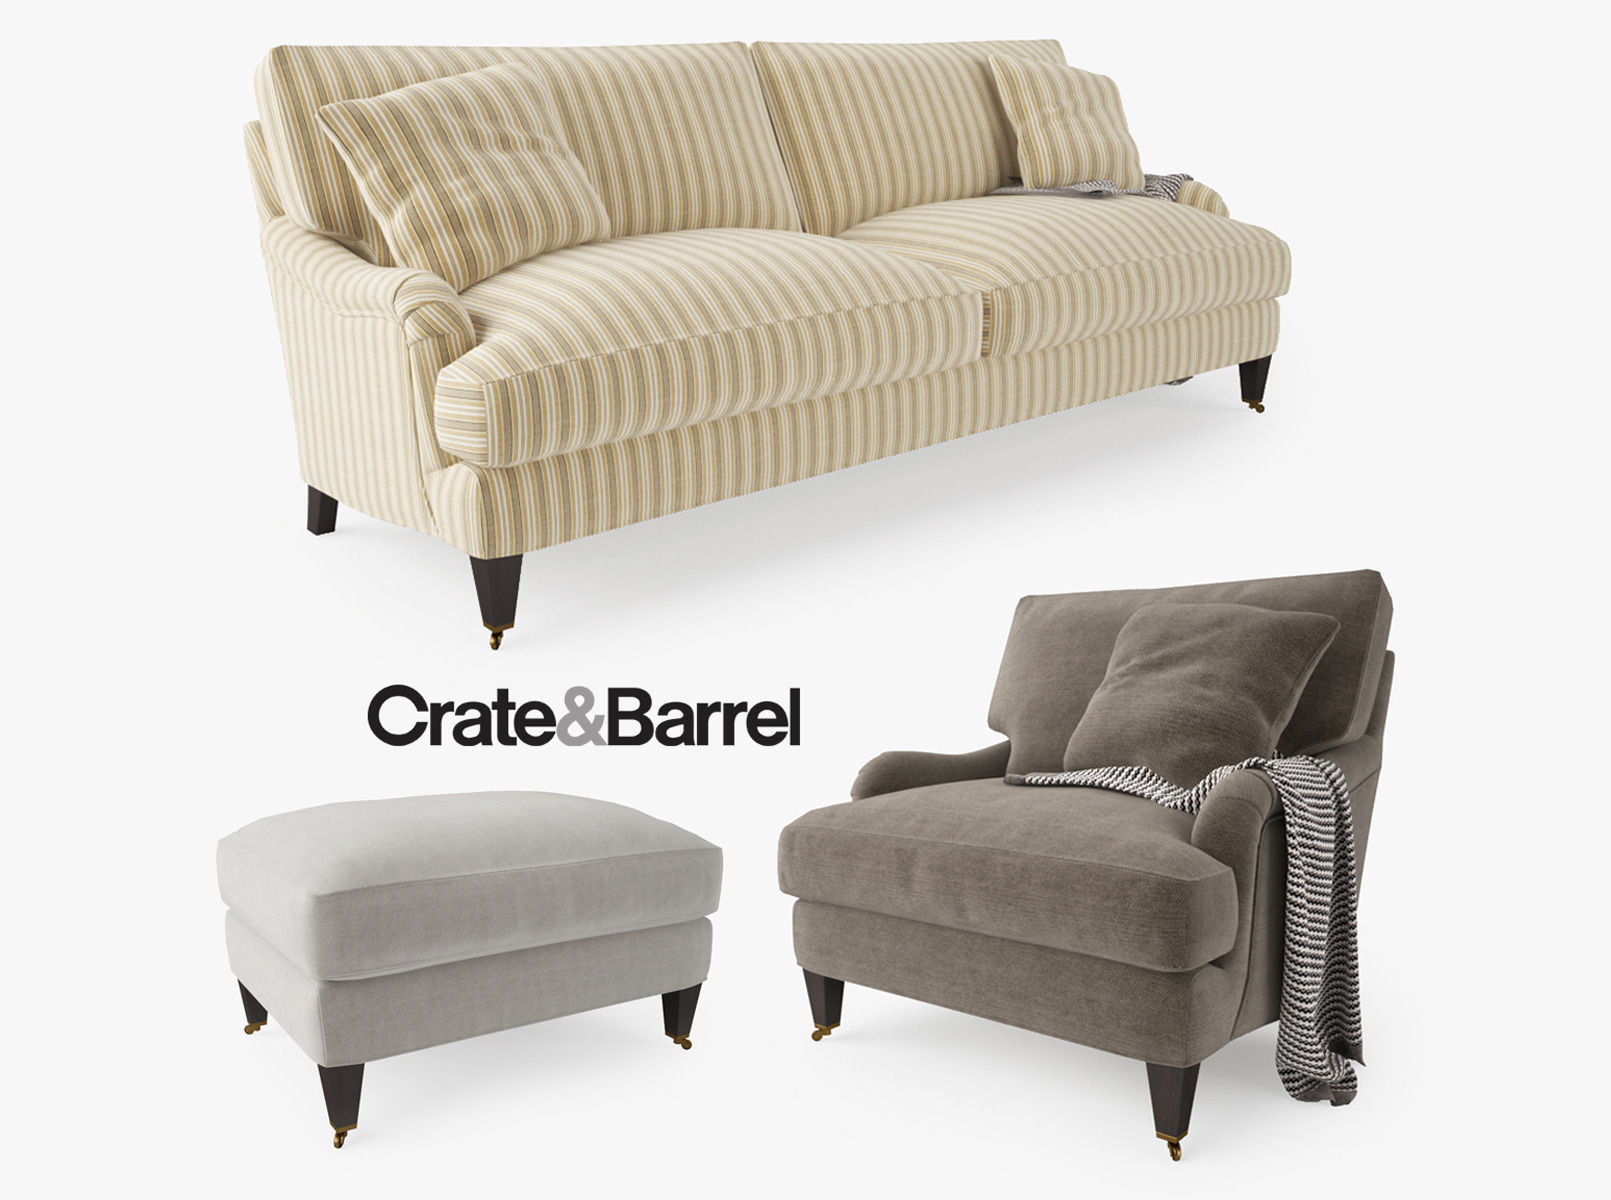 essex sofas top grain leather sofa set deals crate and barrel collection 3d model max obj